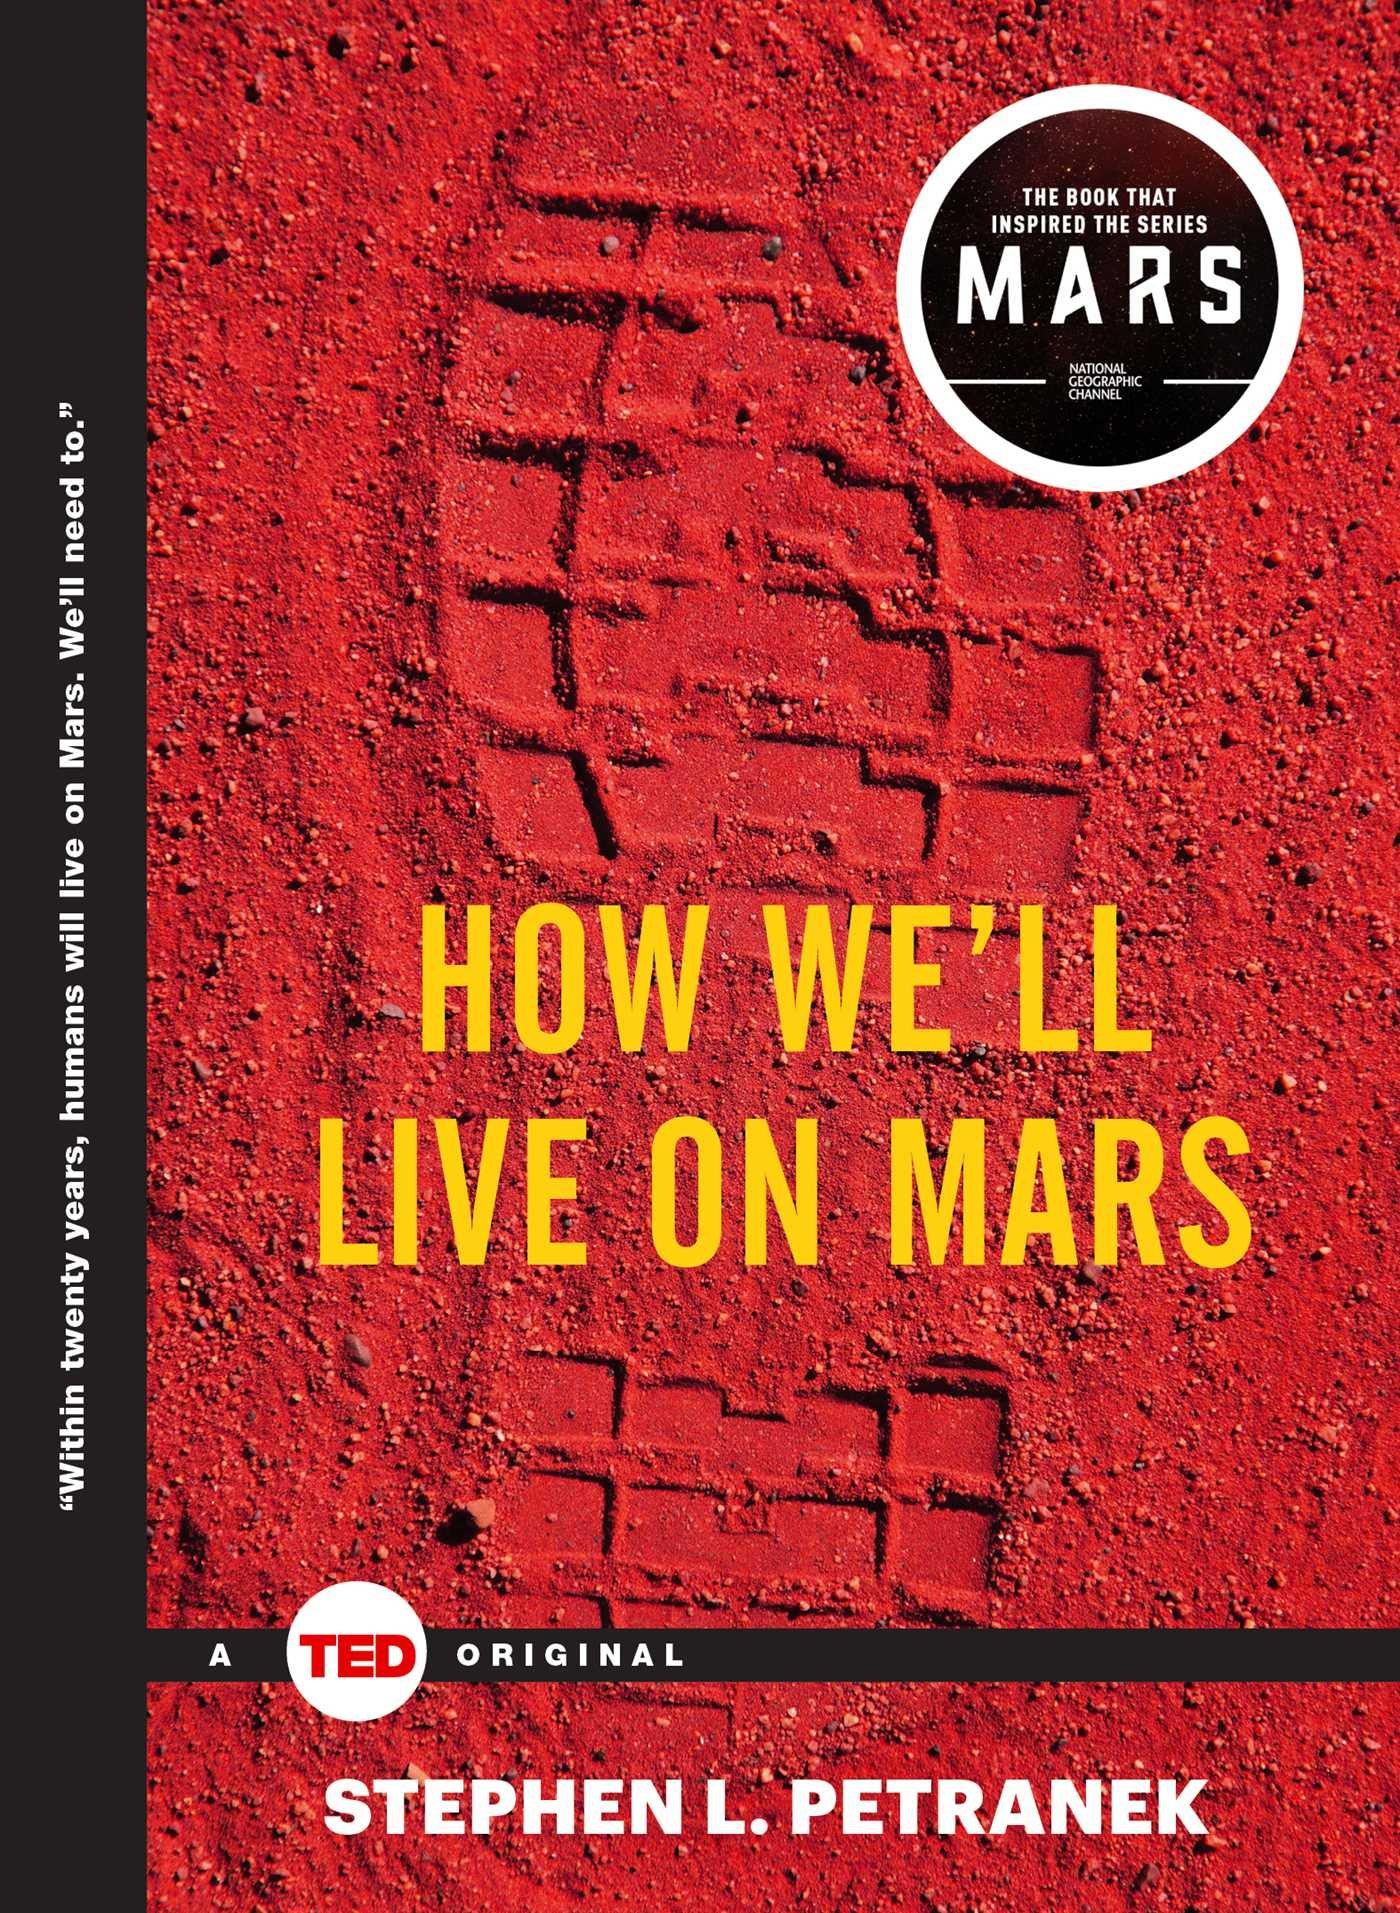 کتاب how we'll live on mars